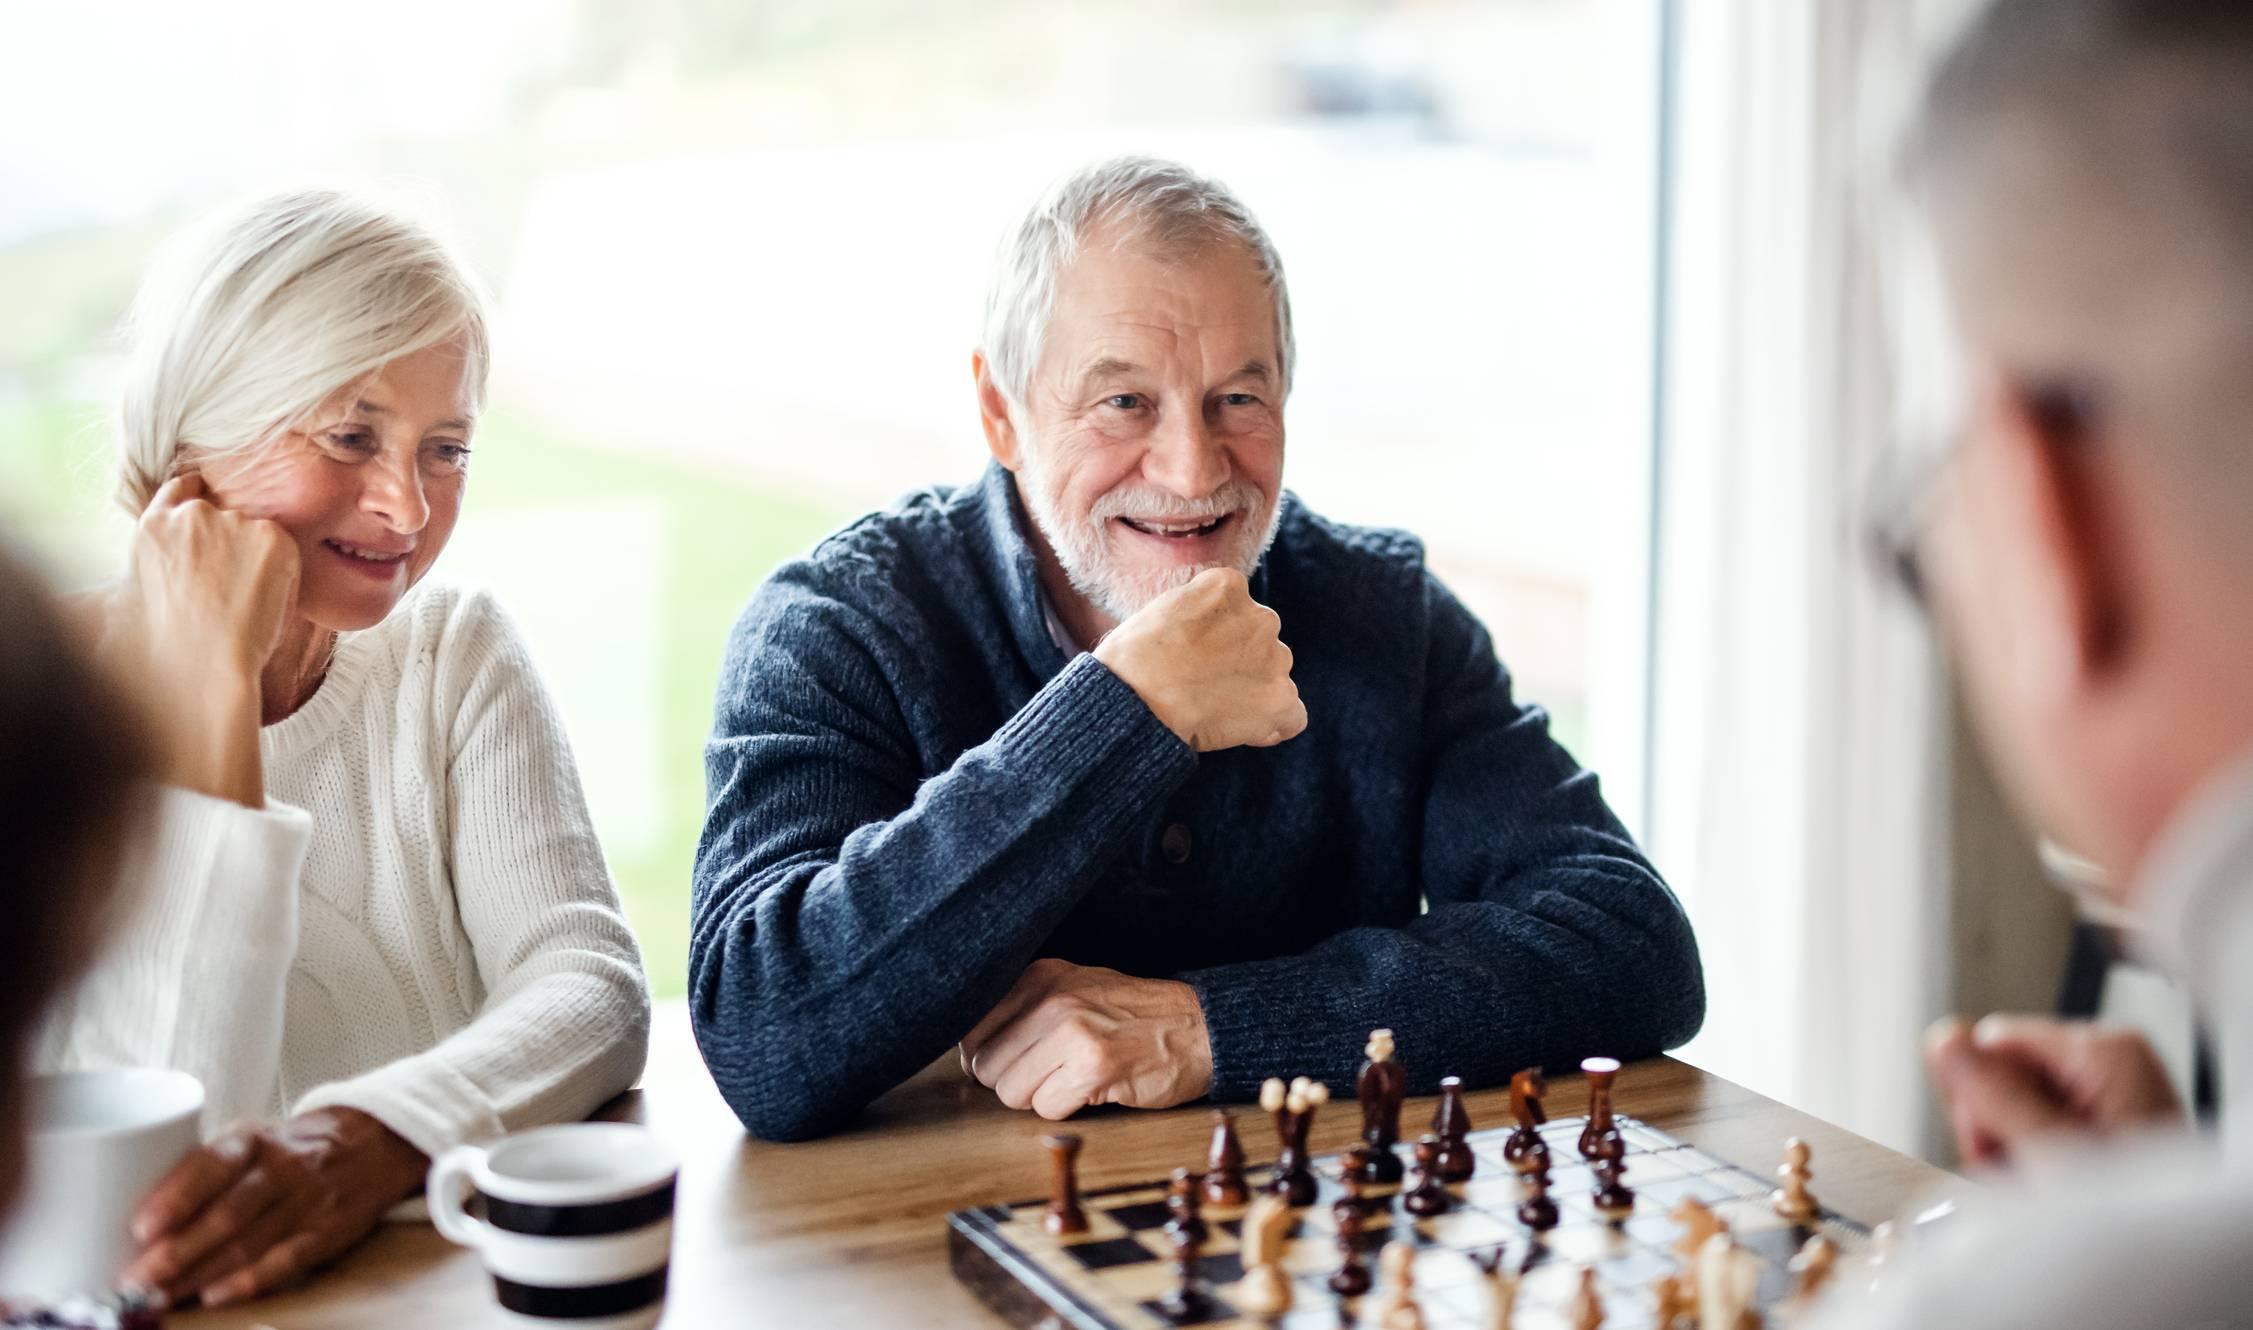 conseils apprendre jeu d'échecs